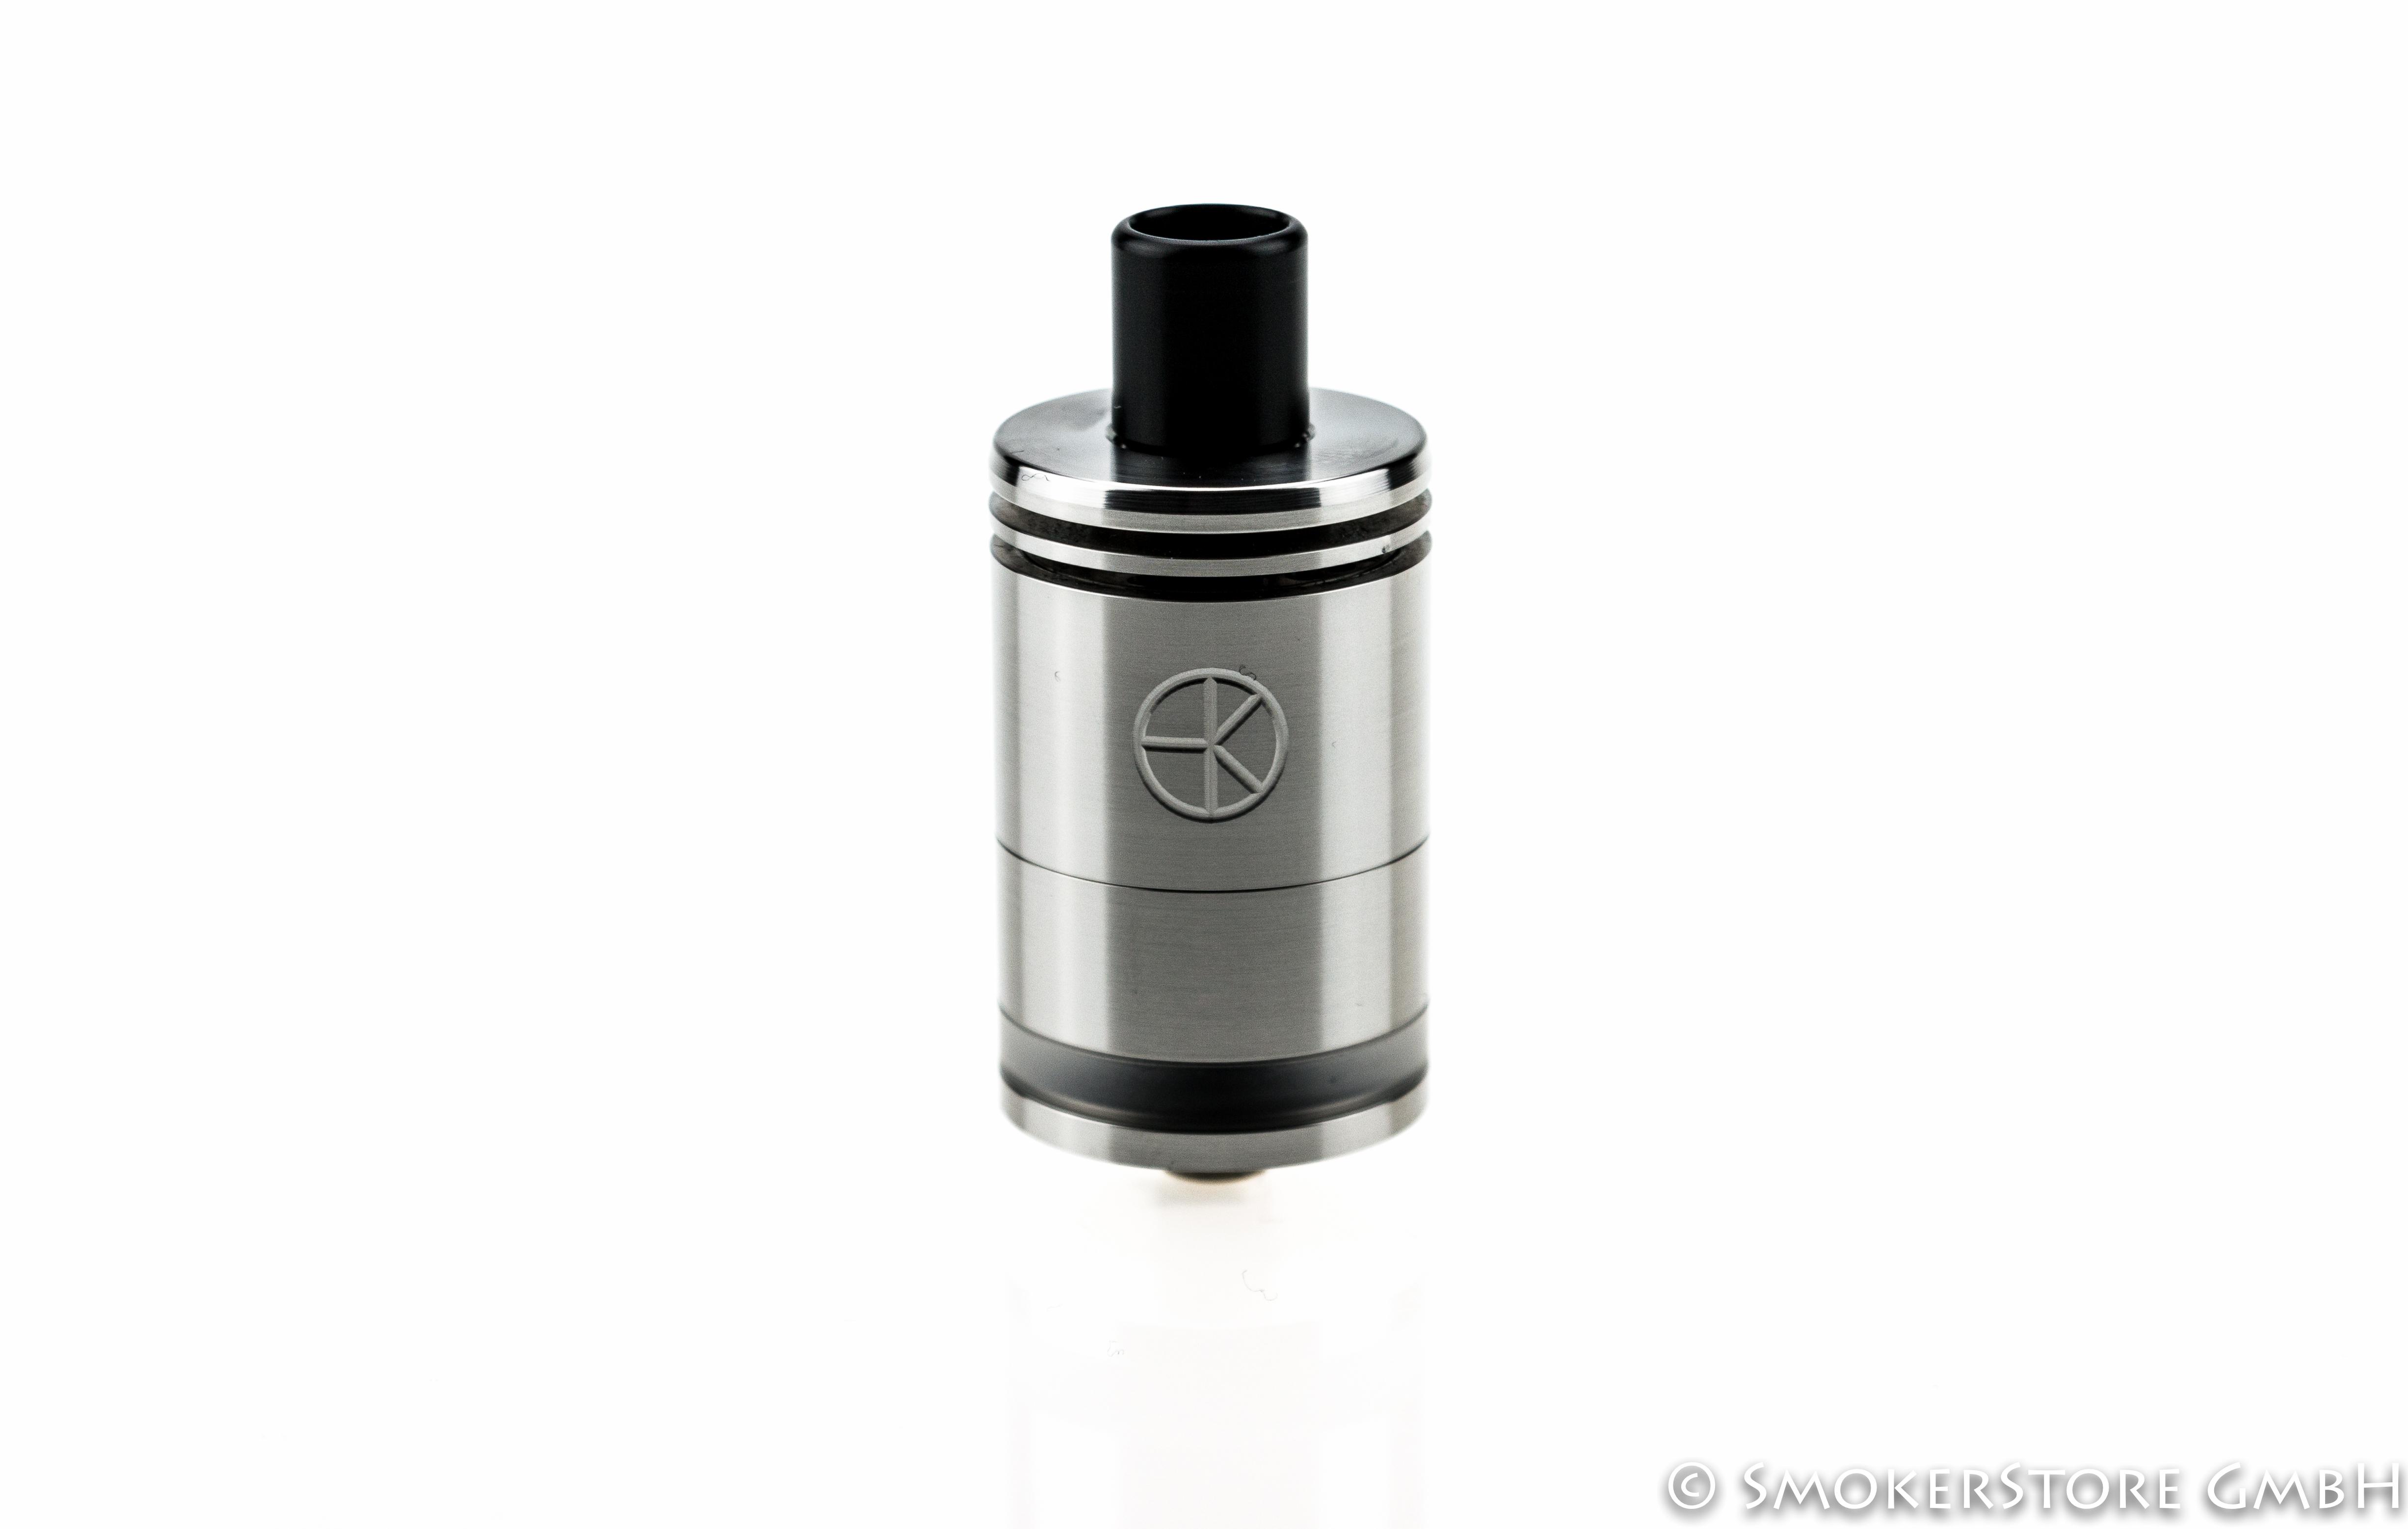 Strålende Kopp Design Tank Ding 23mm (mit Glastank) | Smokerstore PO-09